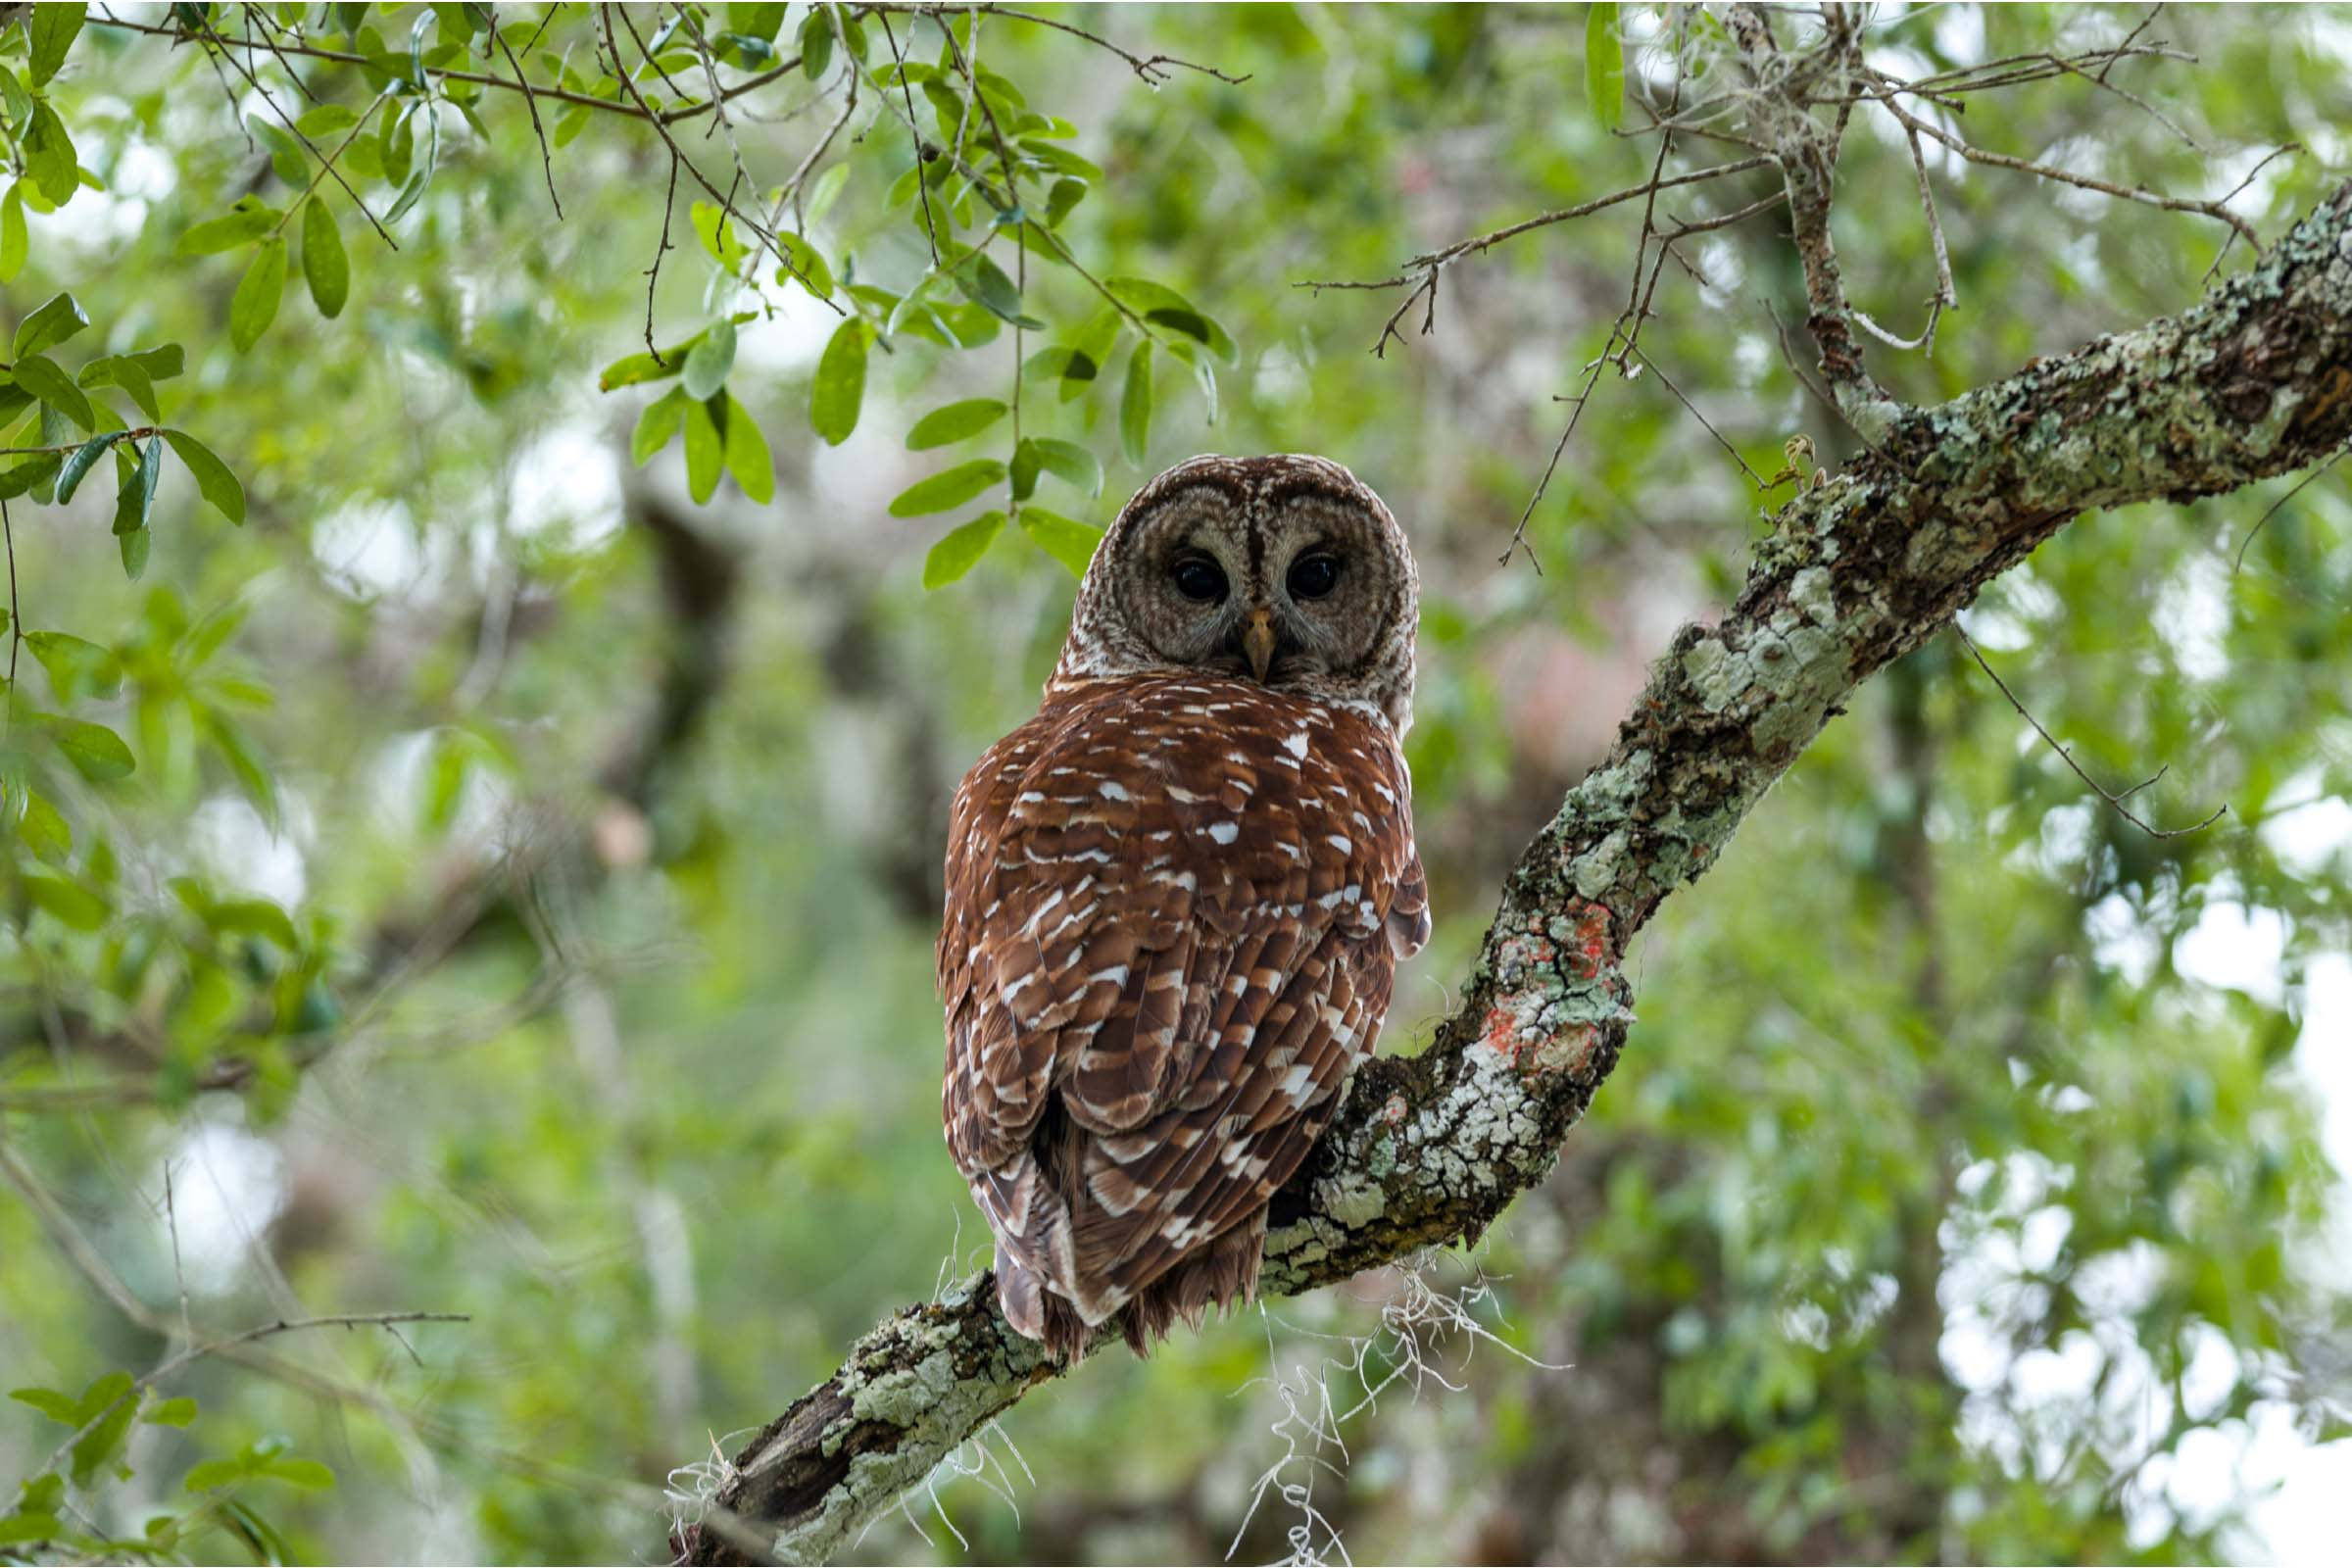 Brown owl sitting on a tree brach